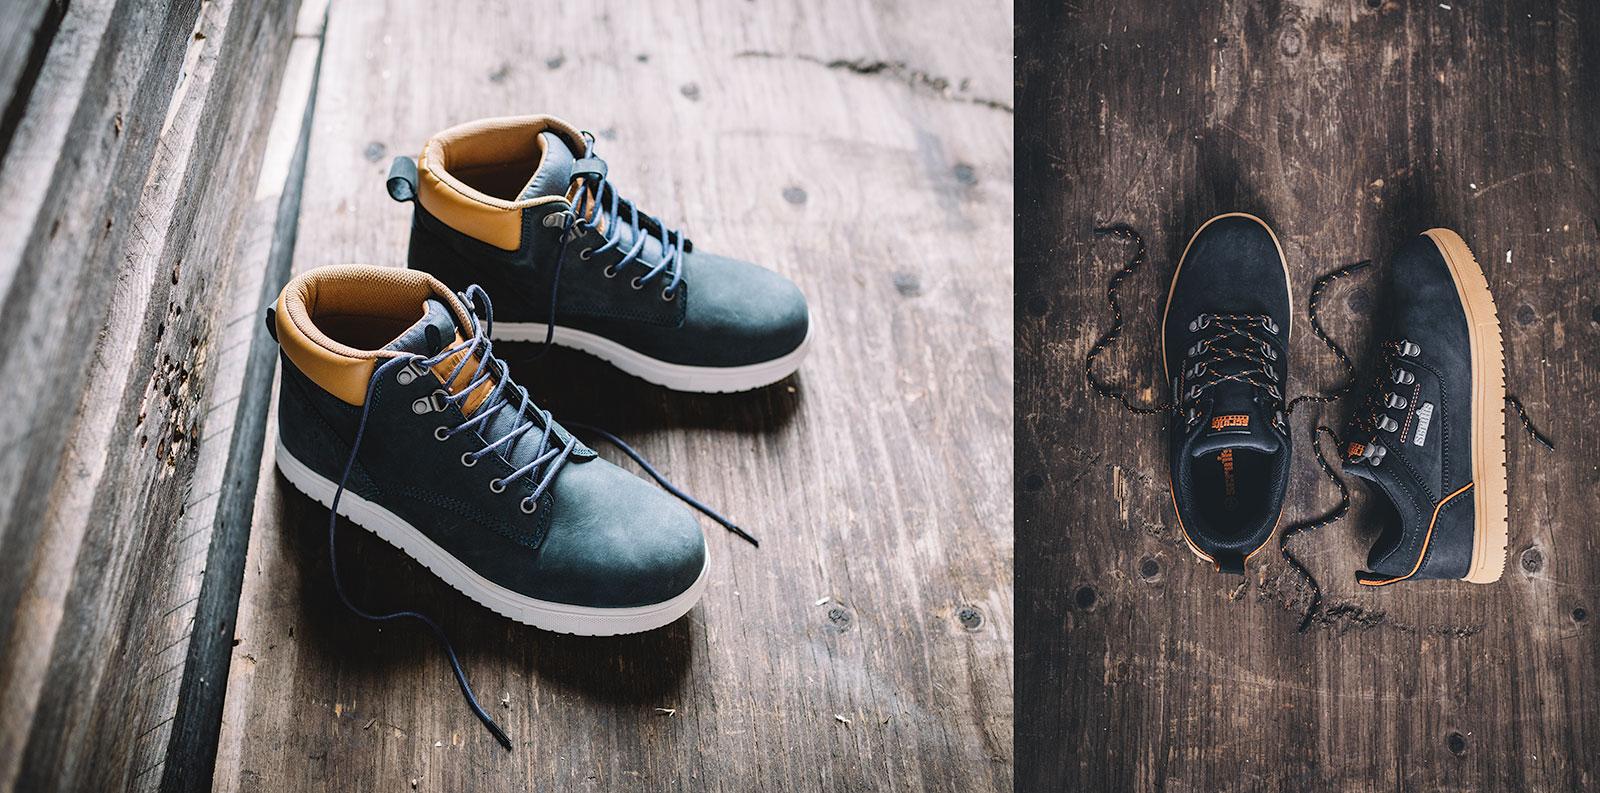 Scruffs-2016-Boots-2.jpg